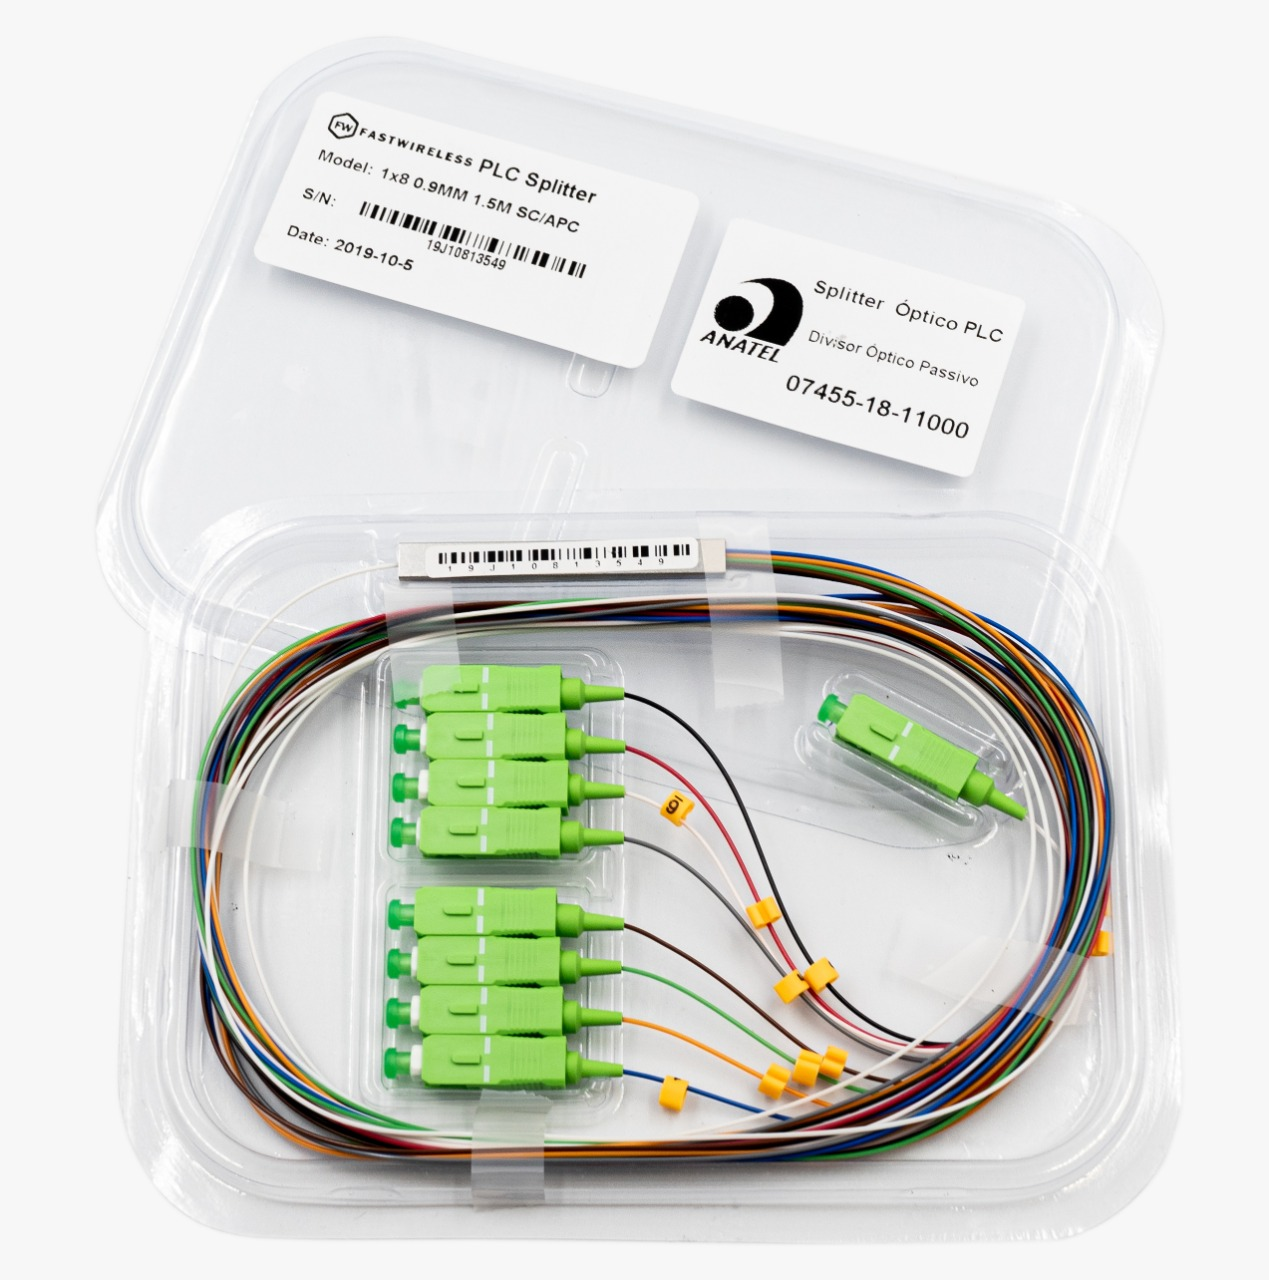 Splitter Óptico PLC 1x8 SC/APC Verde  - FASTWIRELESS